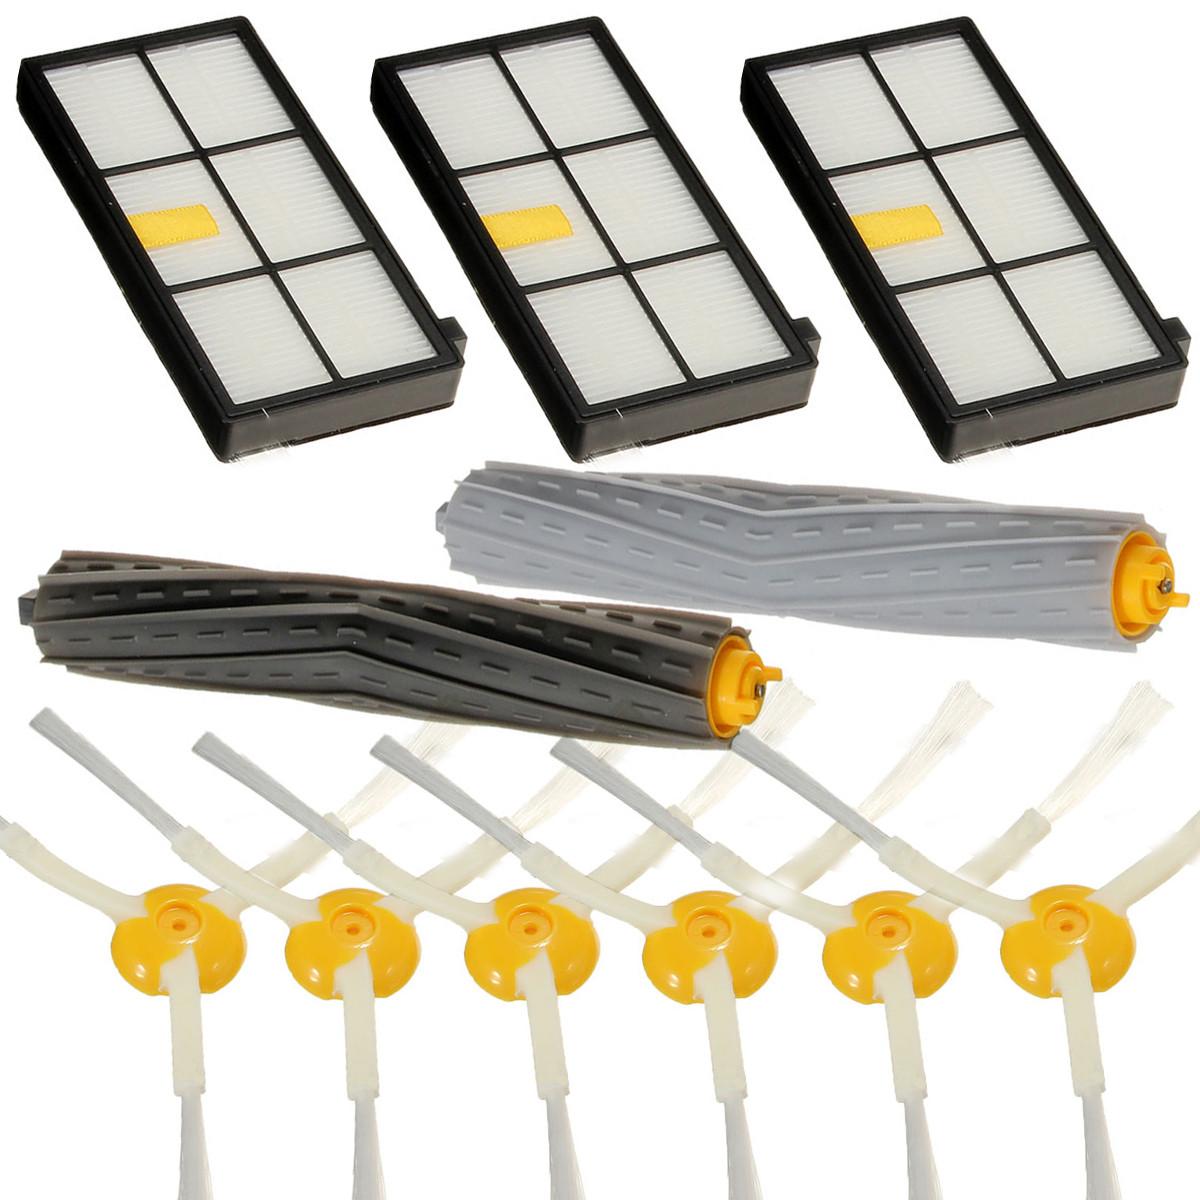 pcs vaccum filtros limpios kit de paquete de cepillo para iRobot Roomba